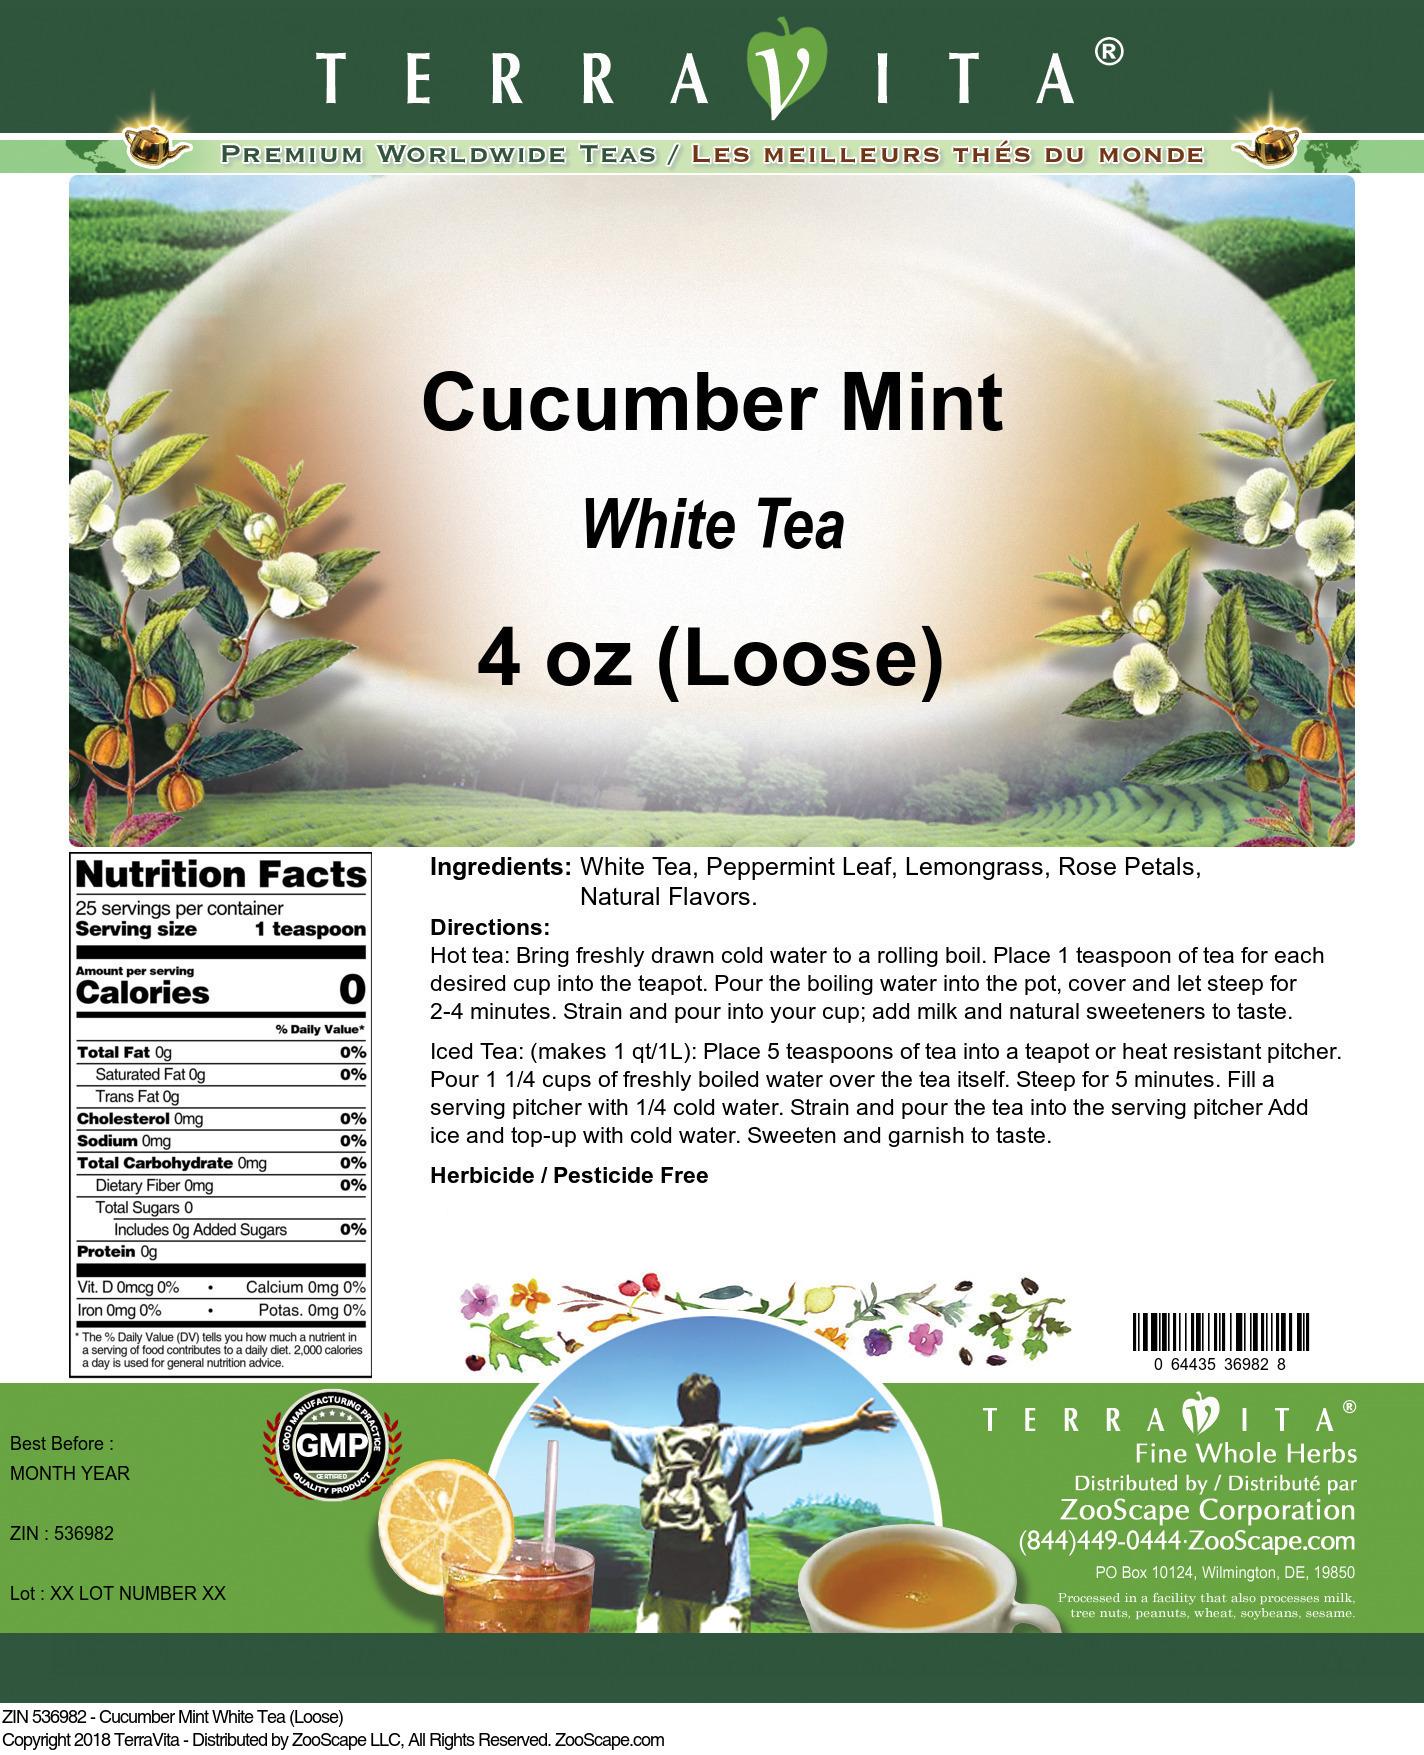 Cucumber Mint White Tea (Loose)